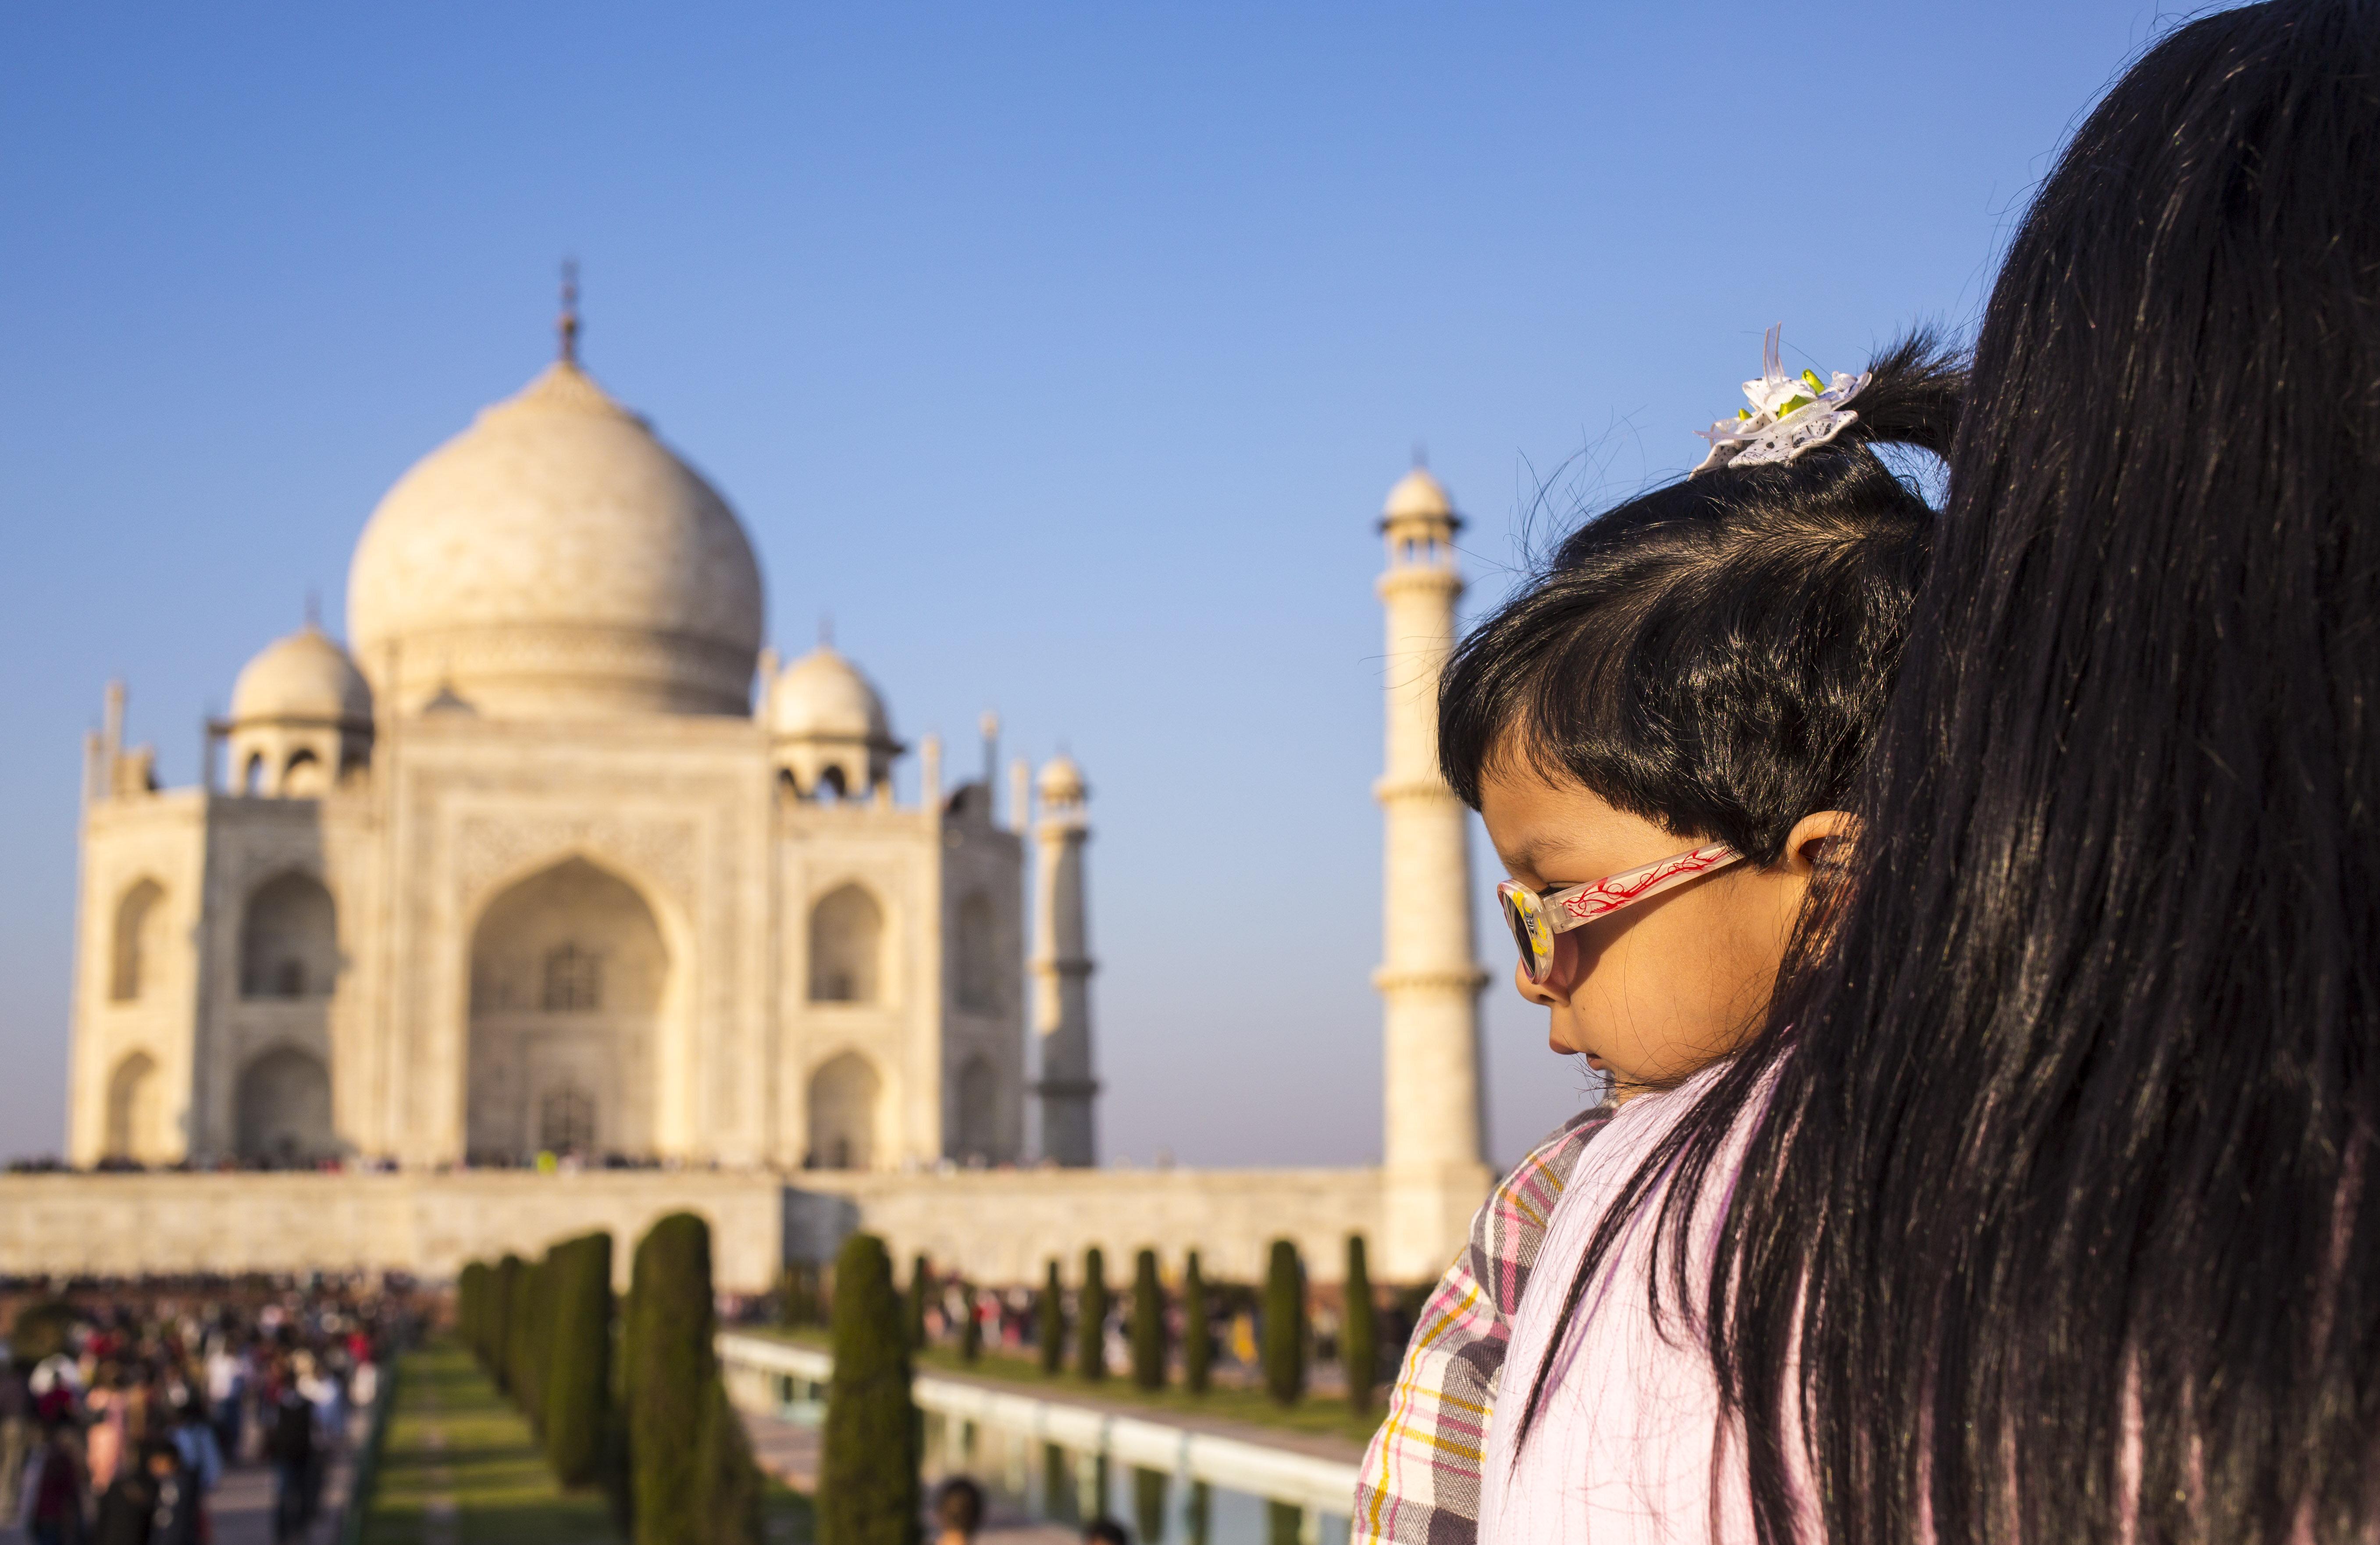 Taj Mahal Adds Breastfeeding Room For 'Millions Of Mothers Who